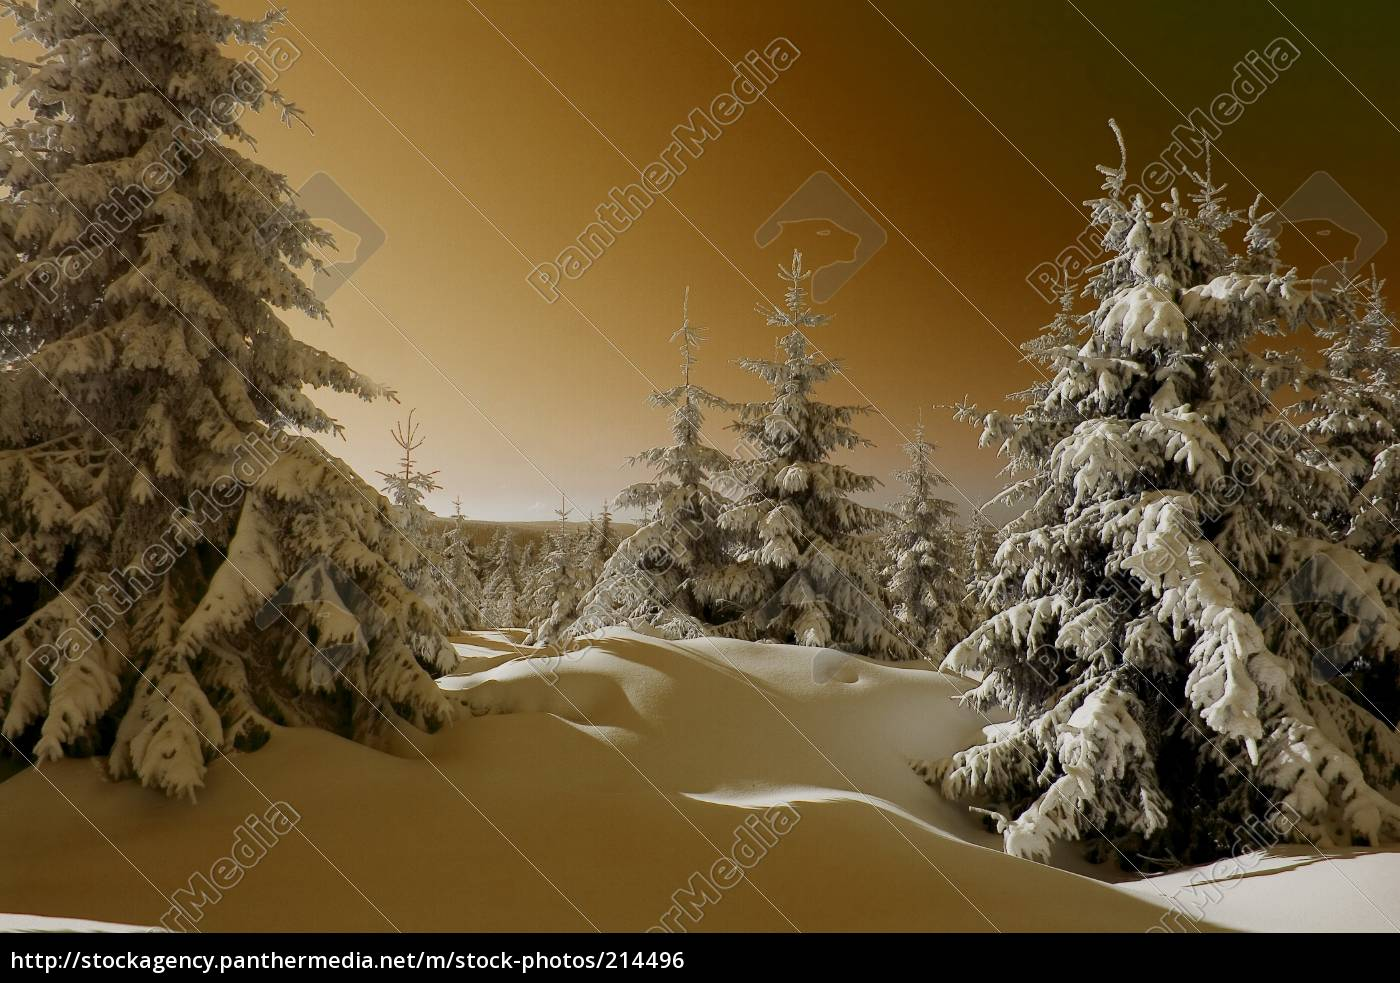 golden, winter - 214496